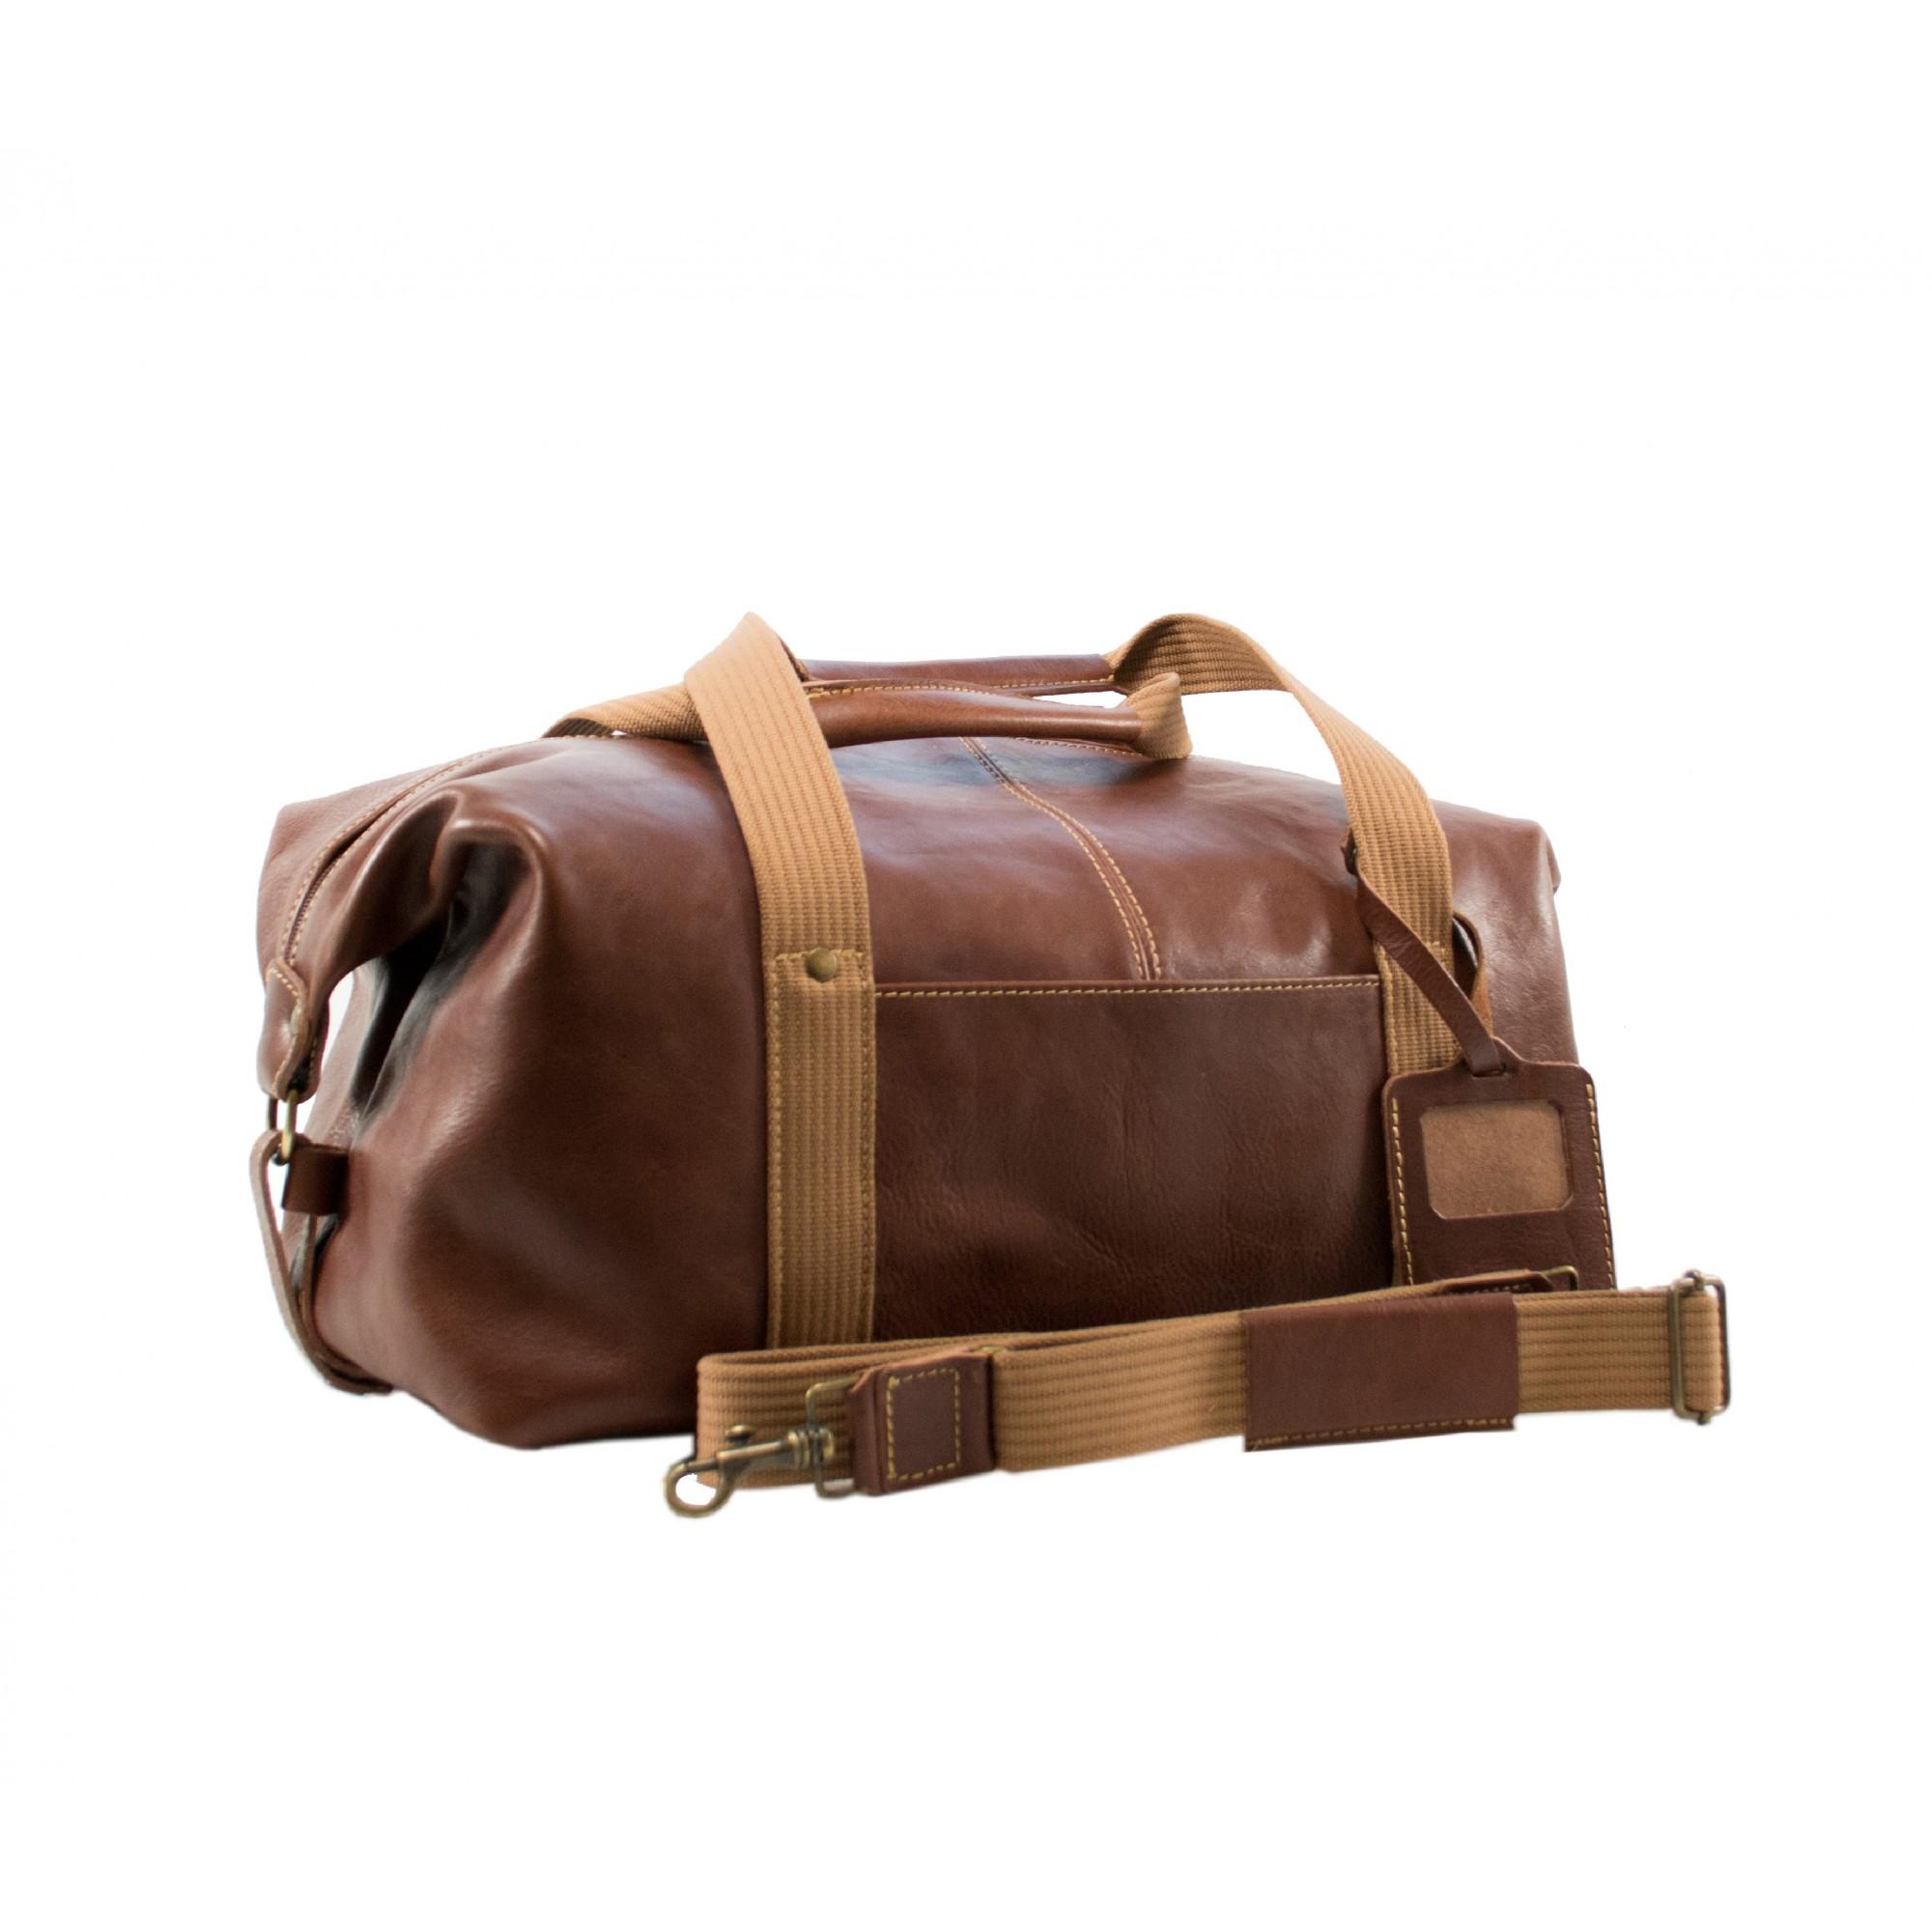 sac de voyage baroudeur